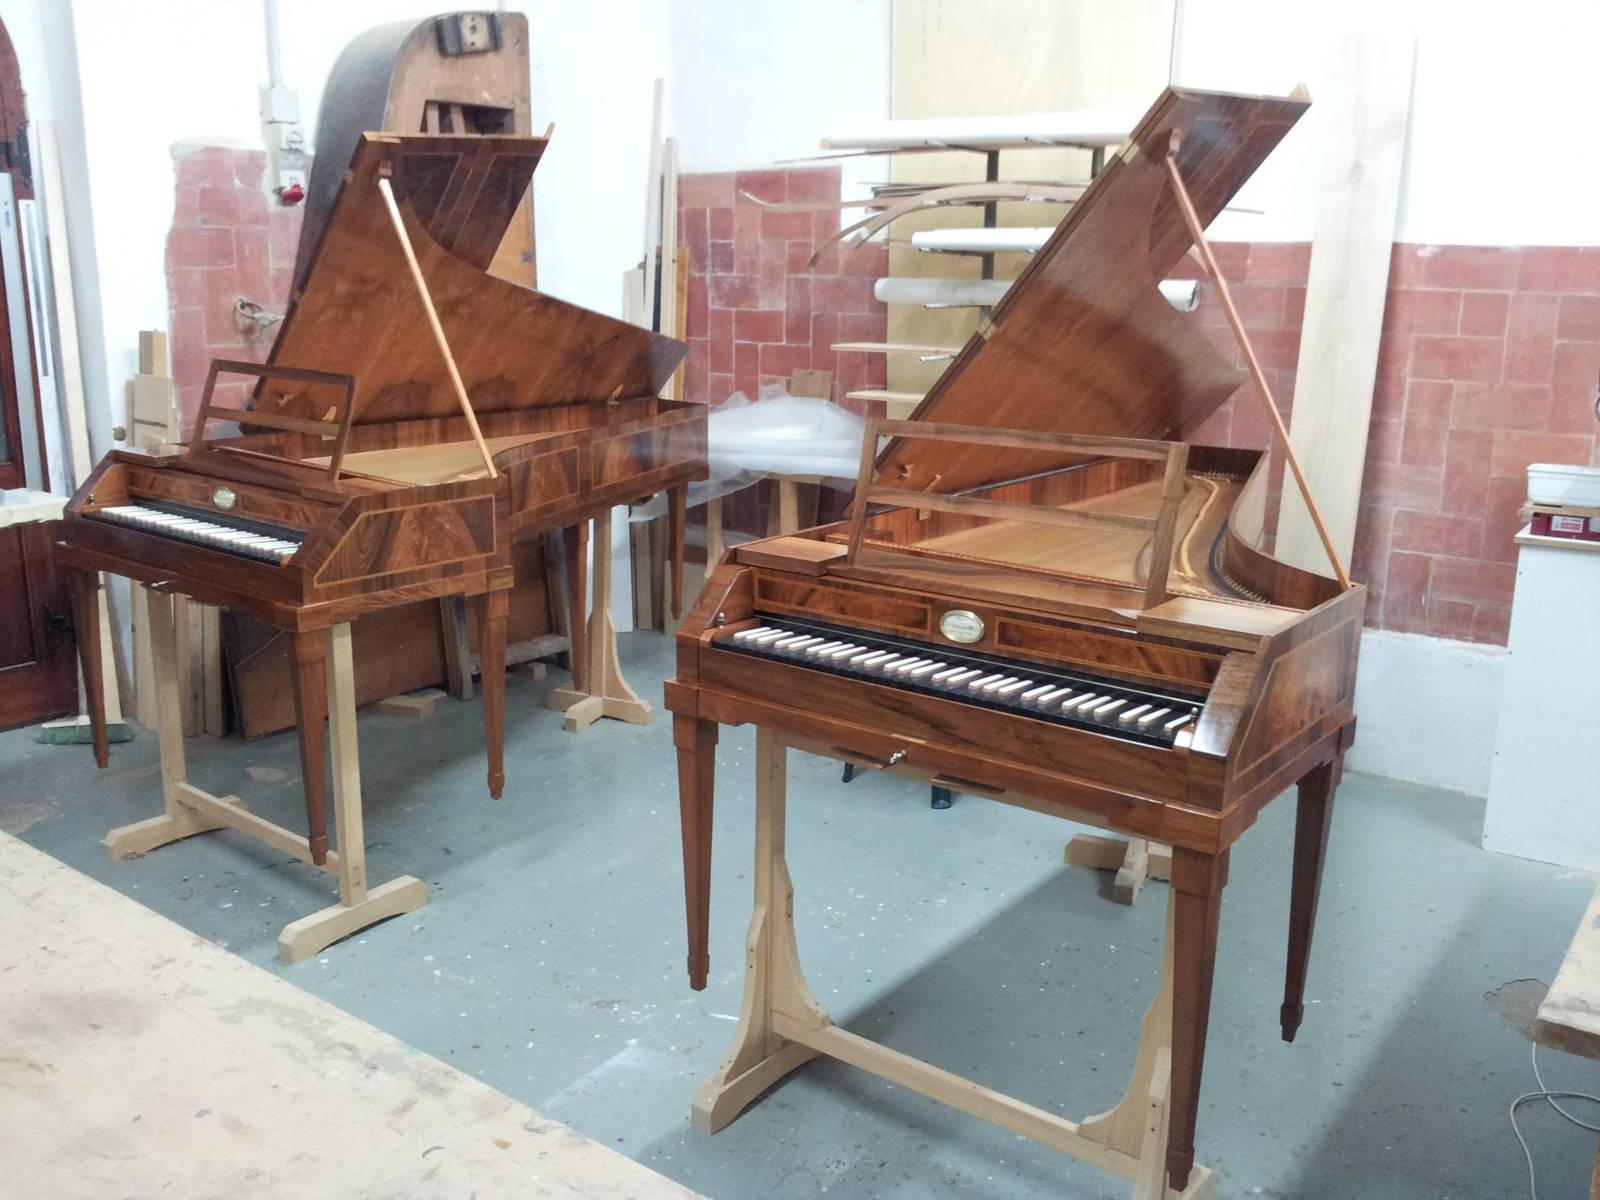 urbano-petroselli-clavicembali-fortepiani (11)